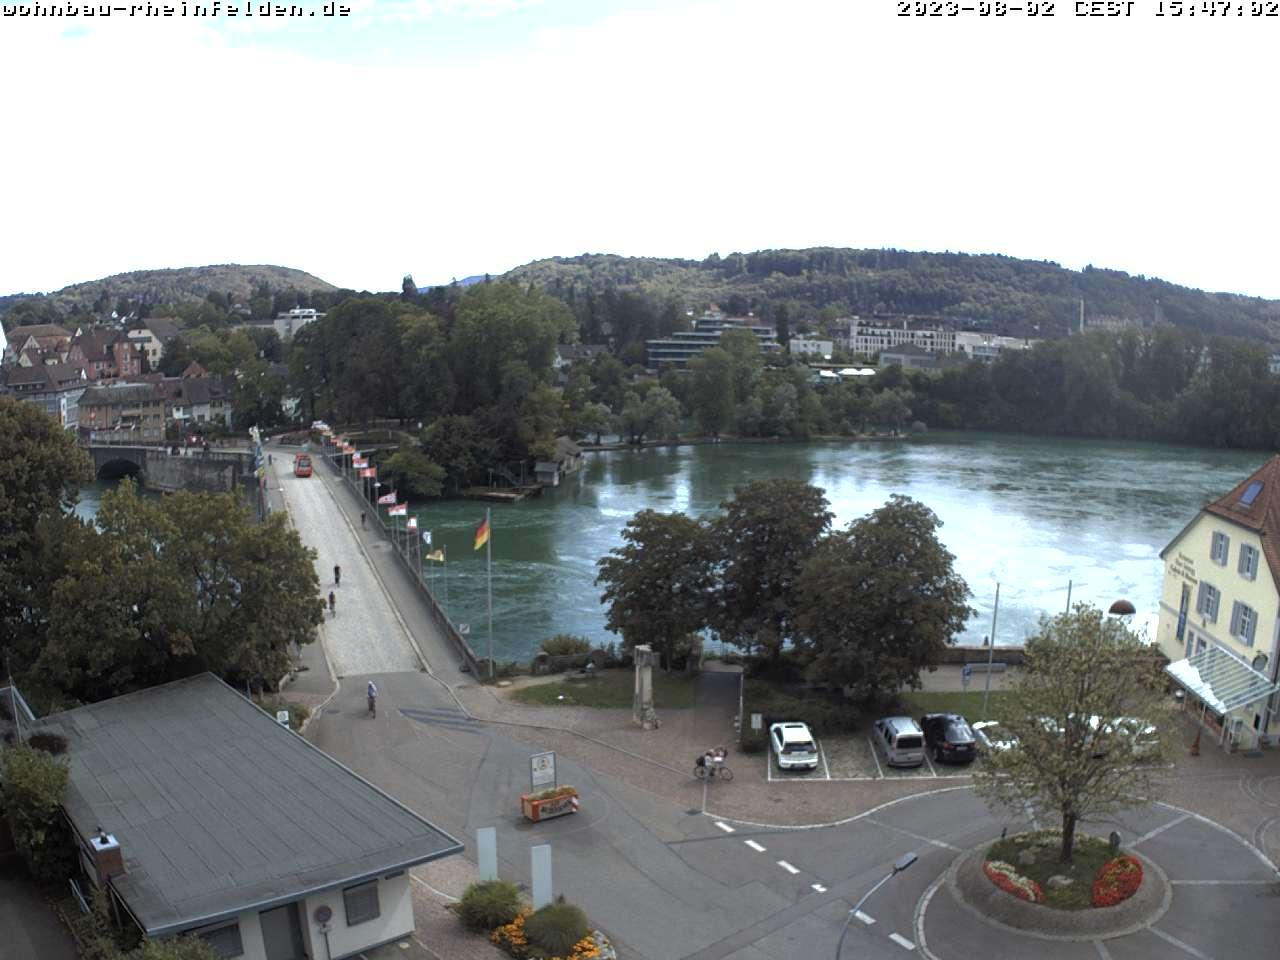 Webcam Wohnbau Rheinfelden